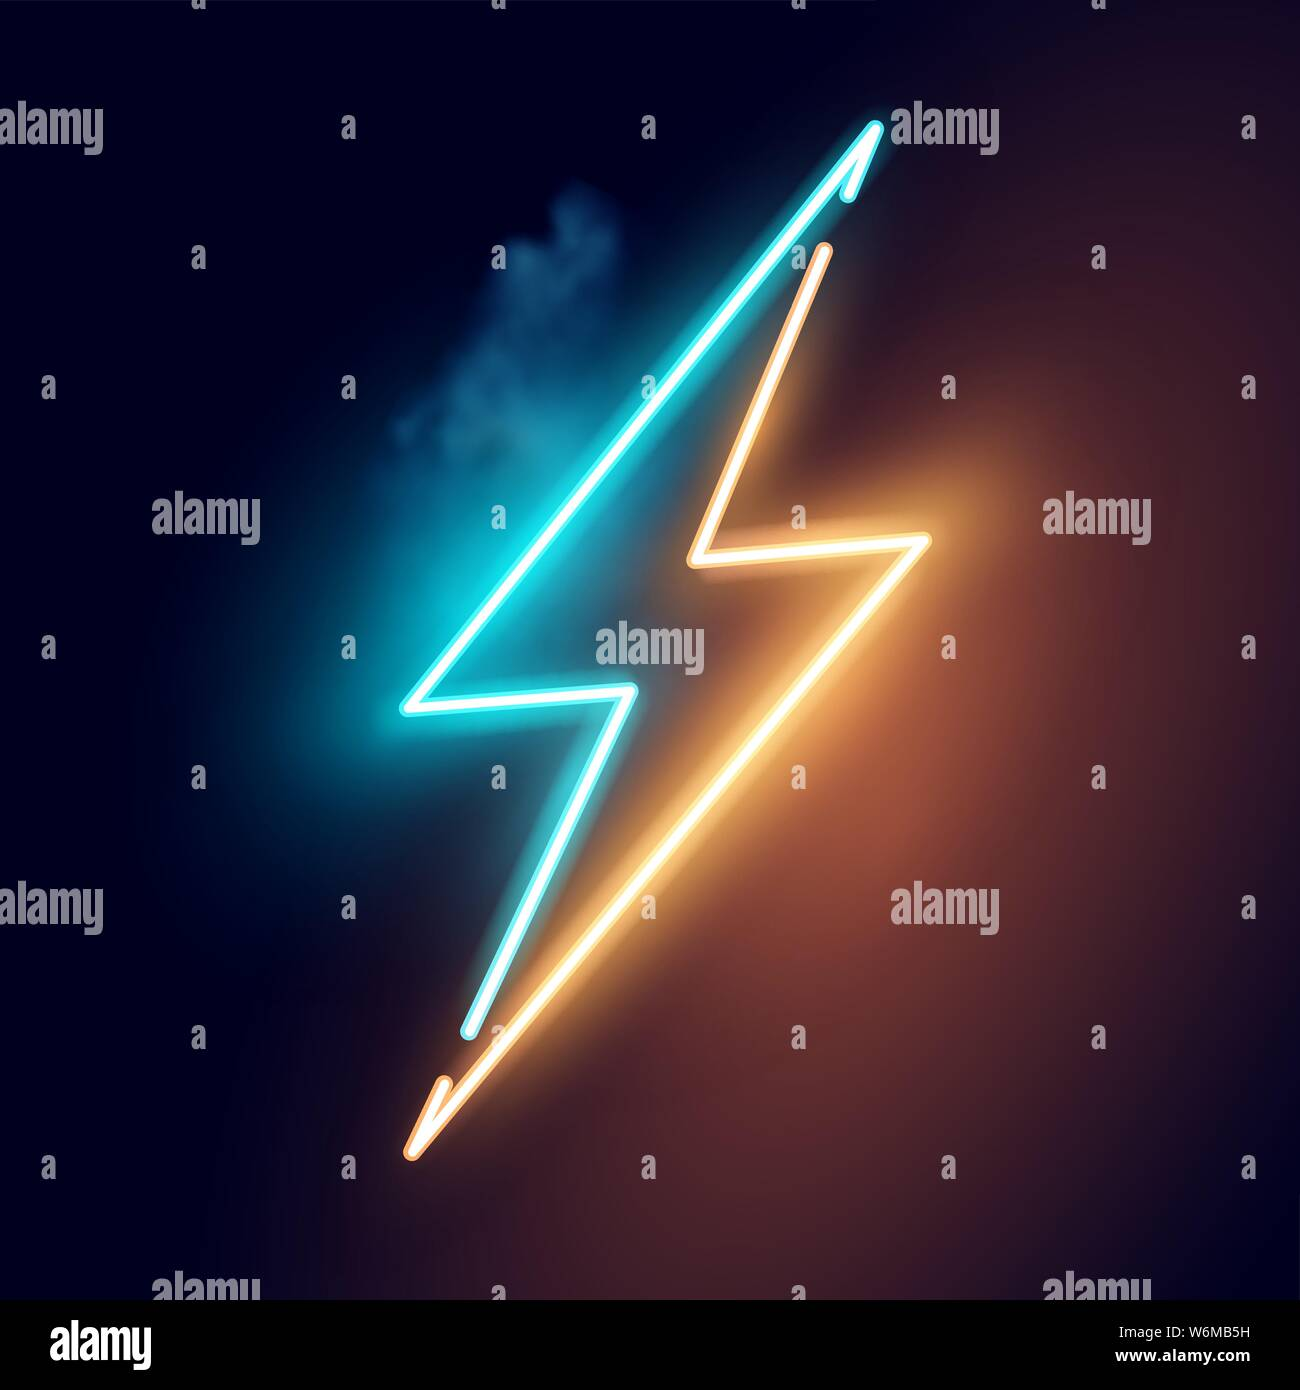 Cool Neon Lightning Art